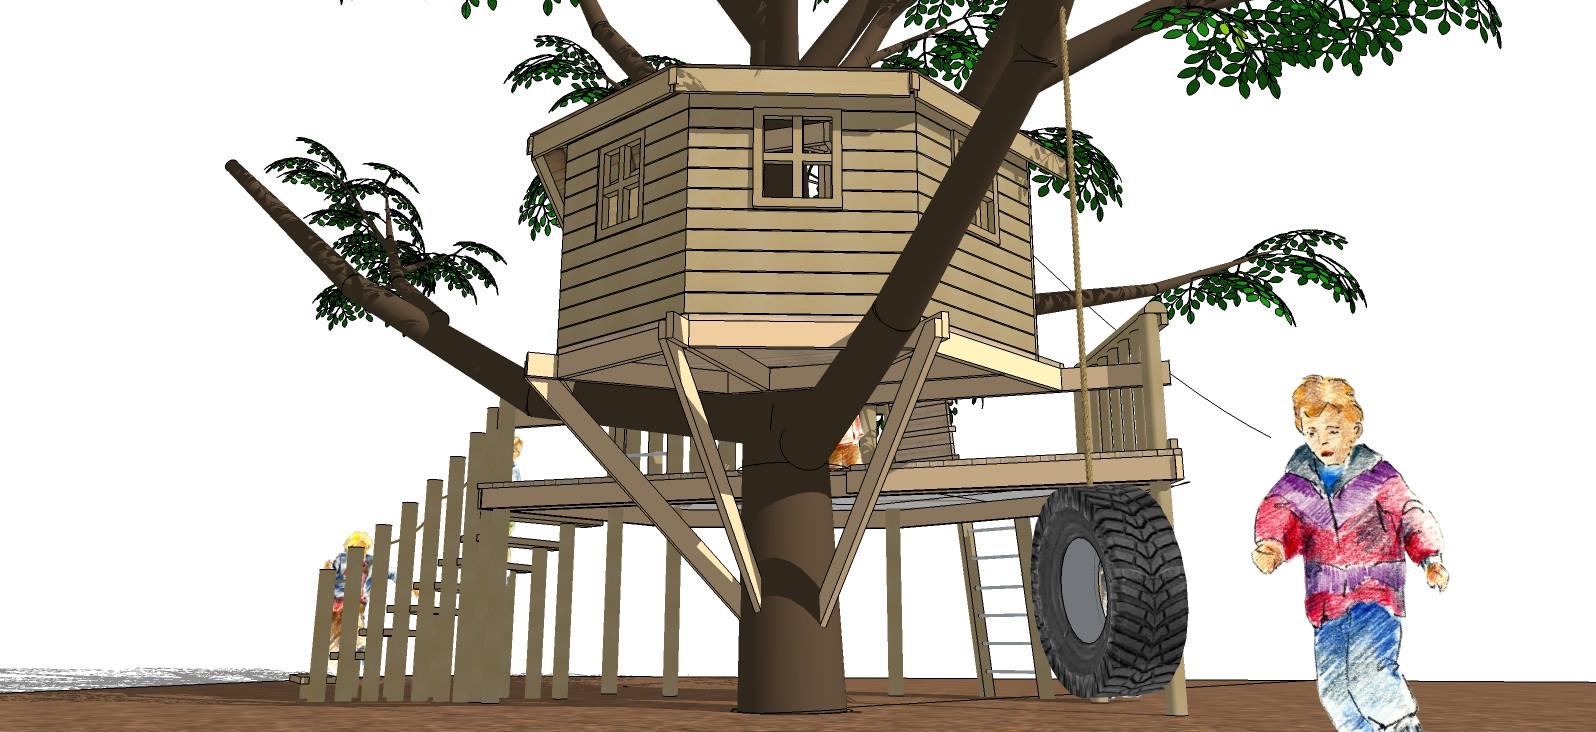 2015_02_09_tree_house_R2_05.jpg